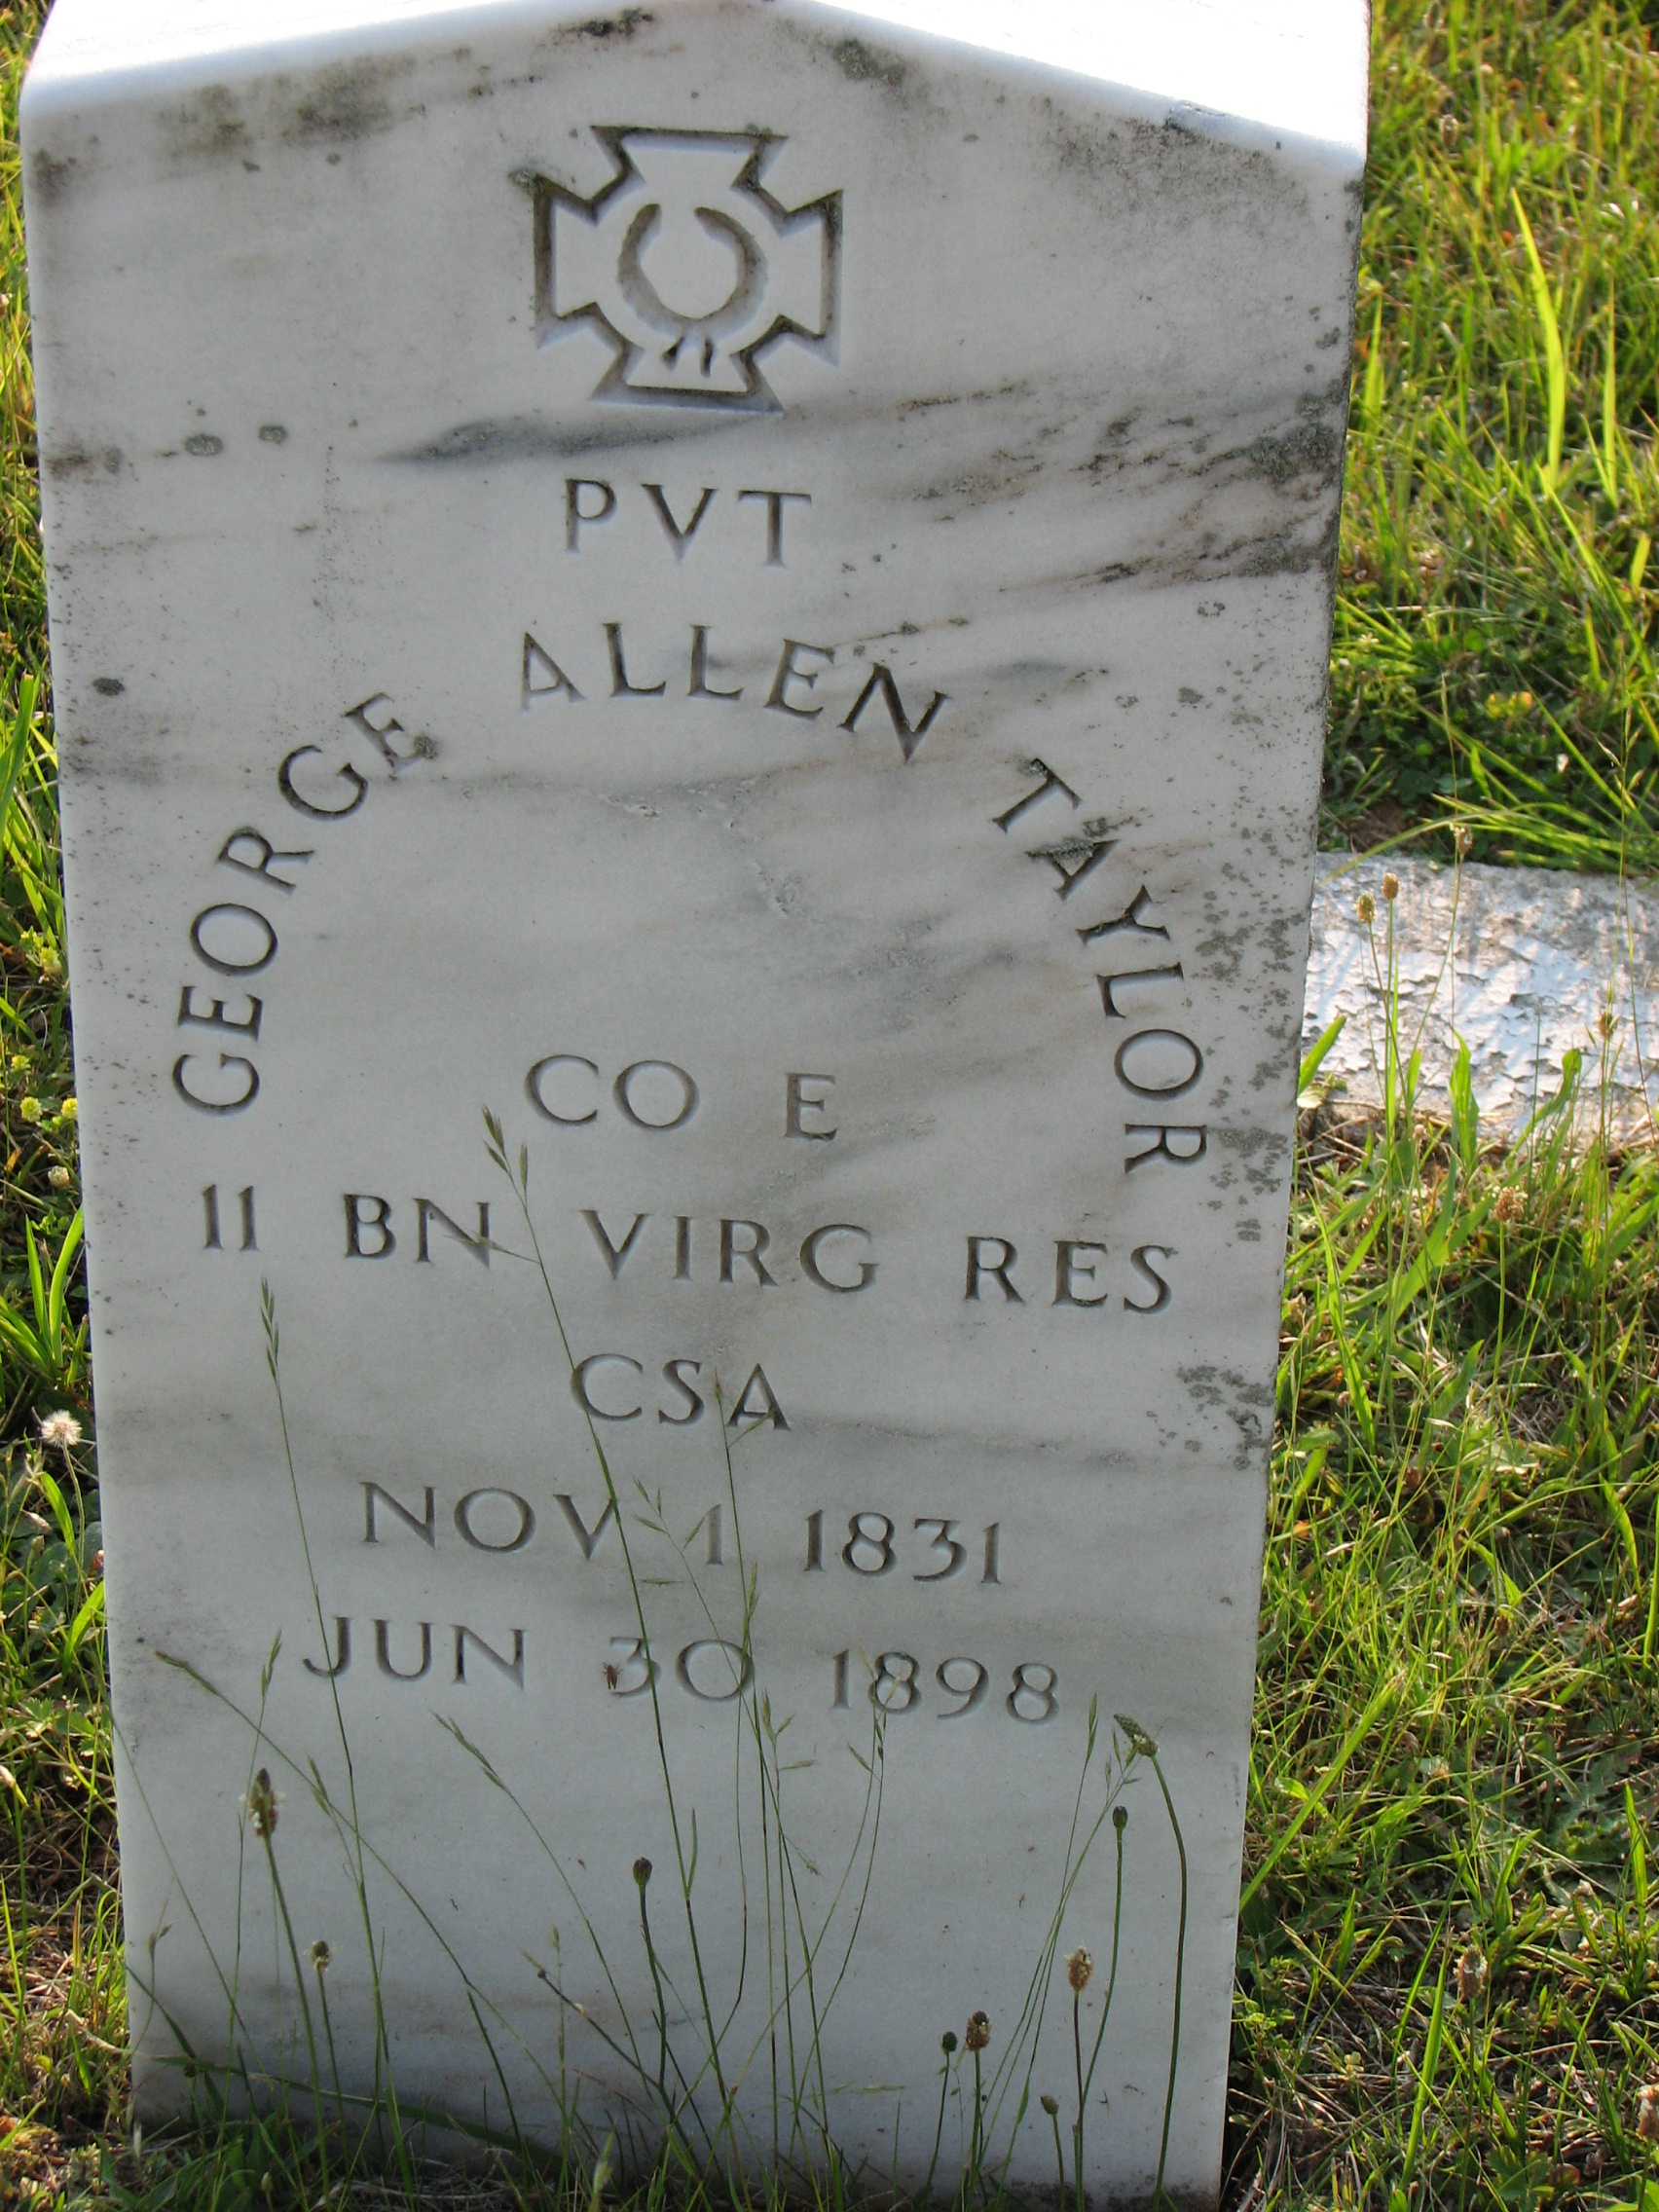 George Allen Taylor